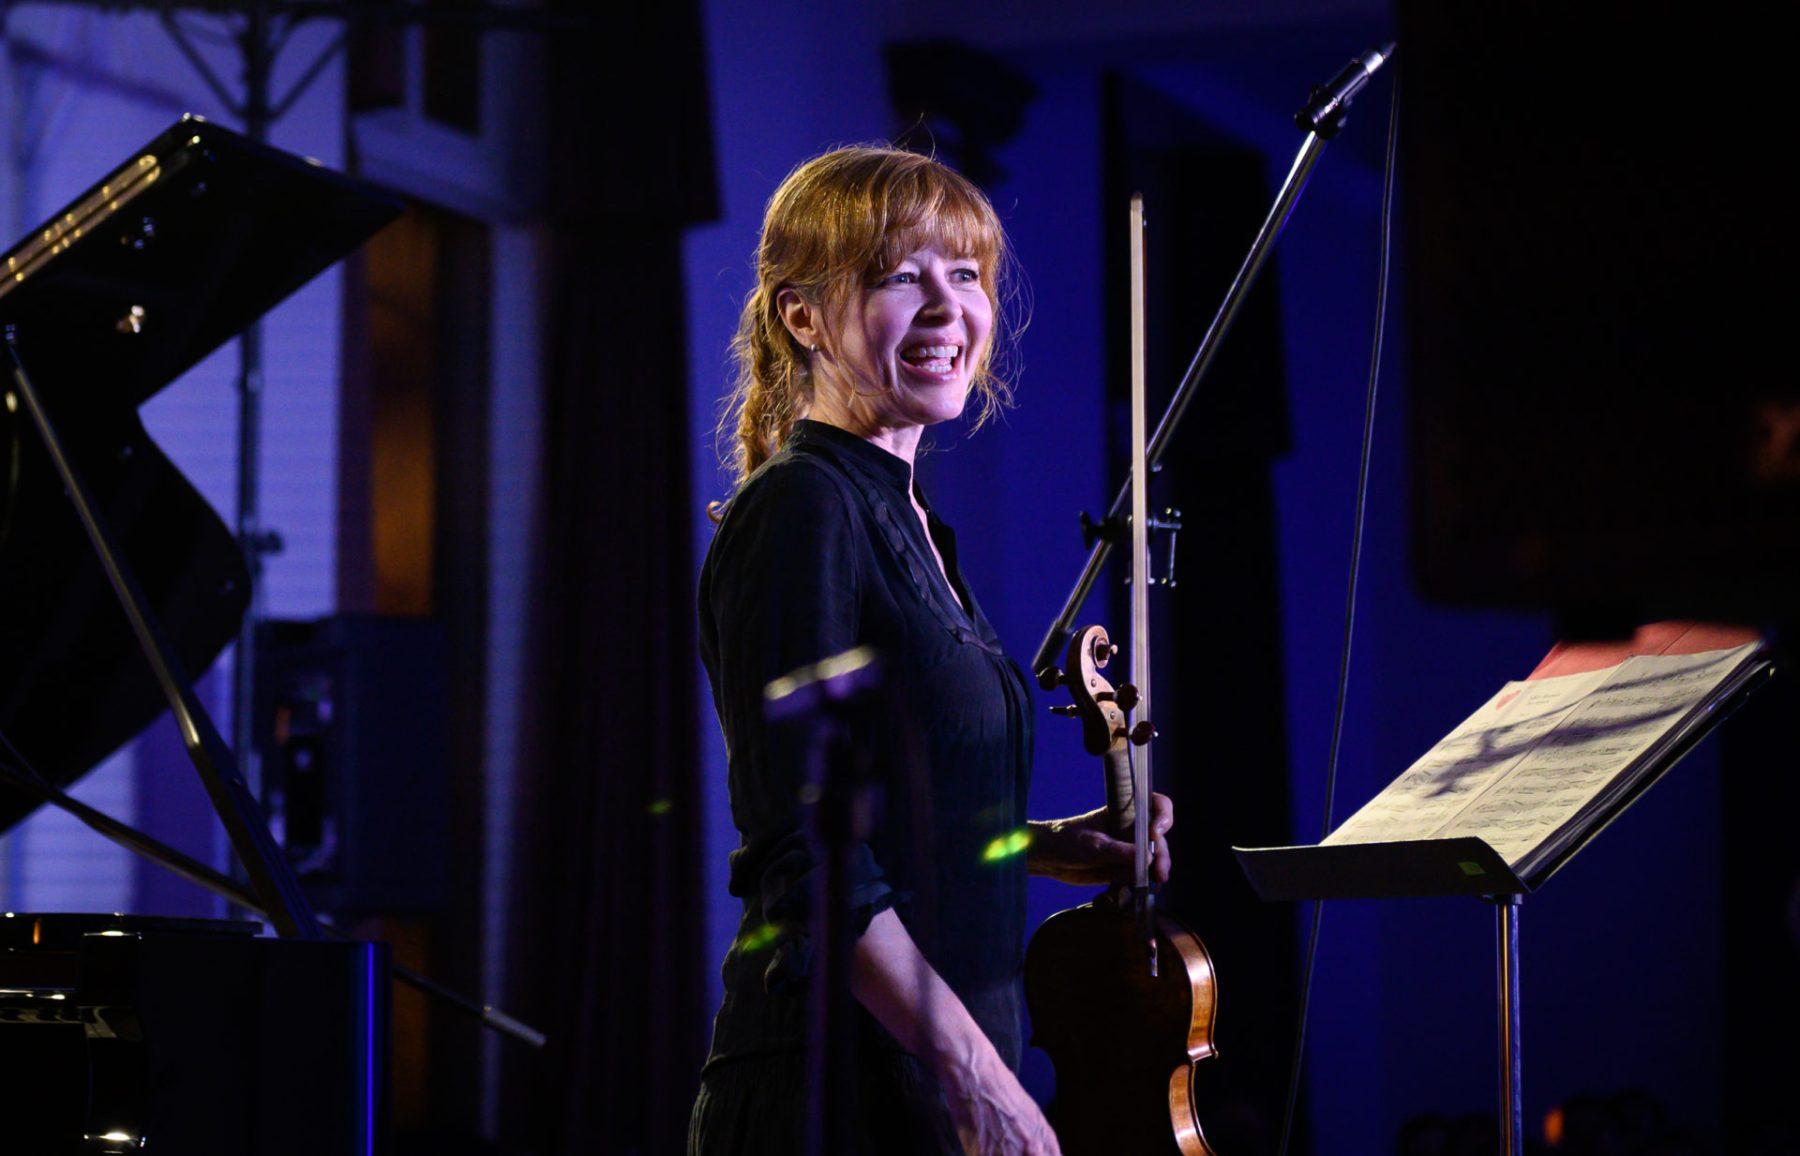 Karen Gerbrecht, Music for the Winter Solstice 2018